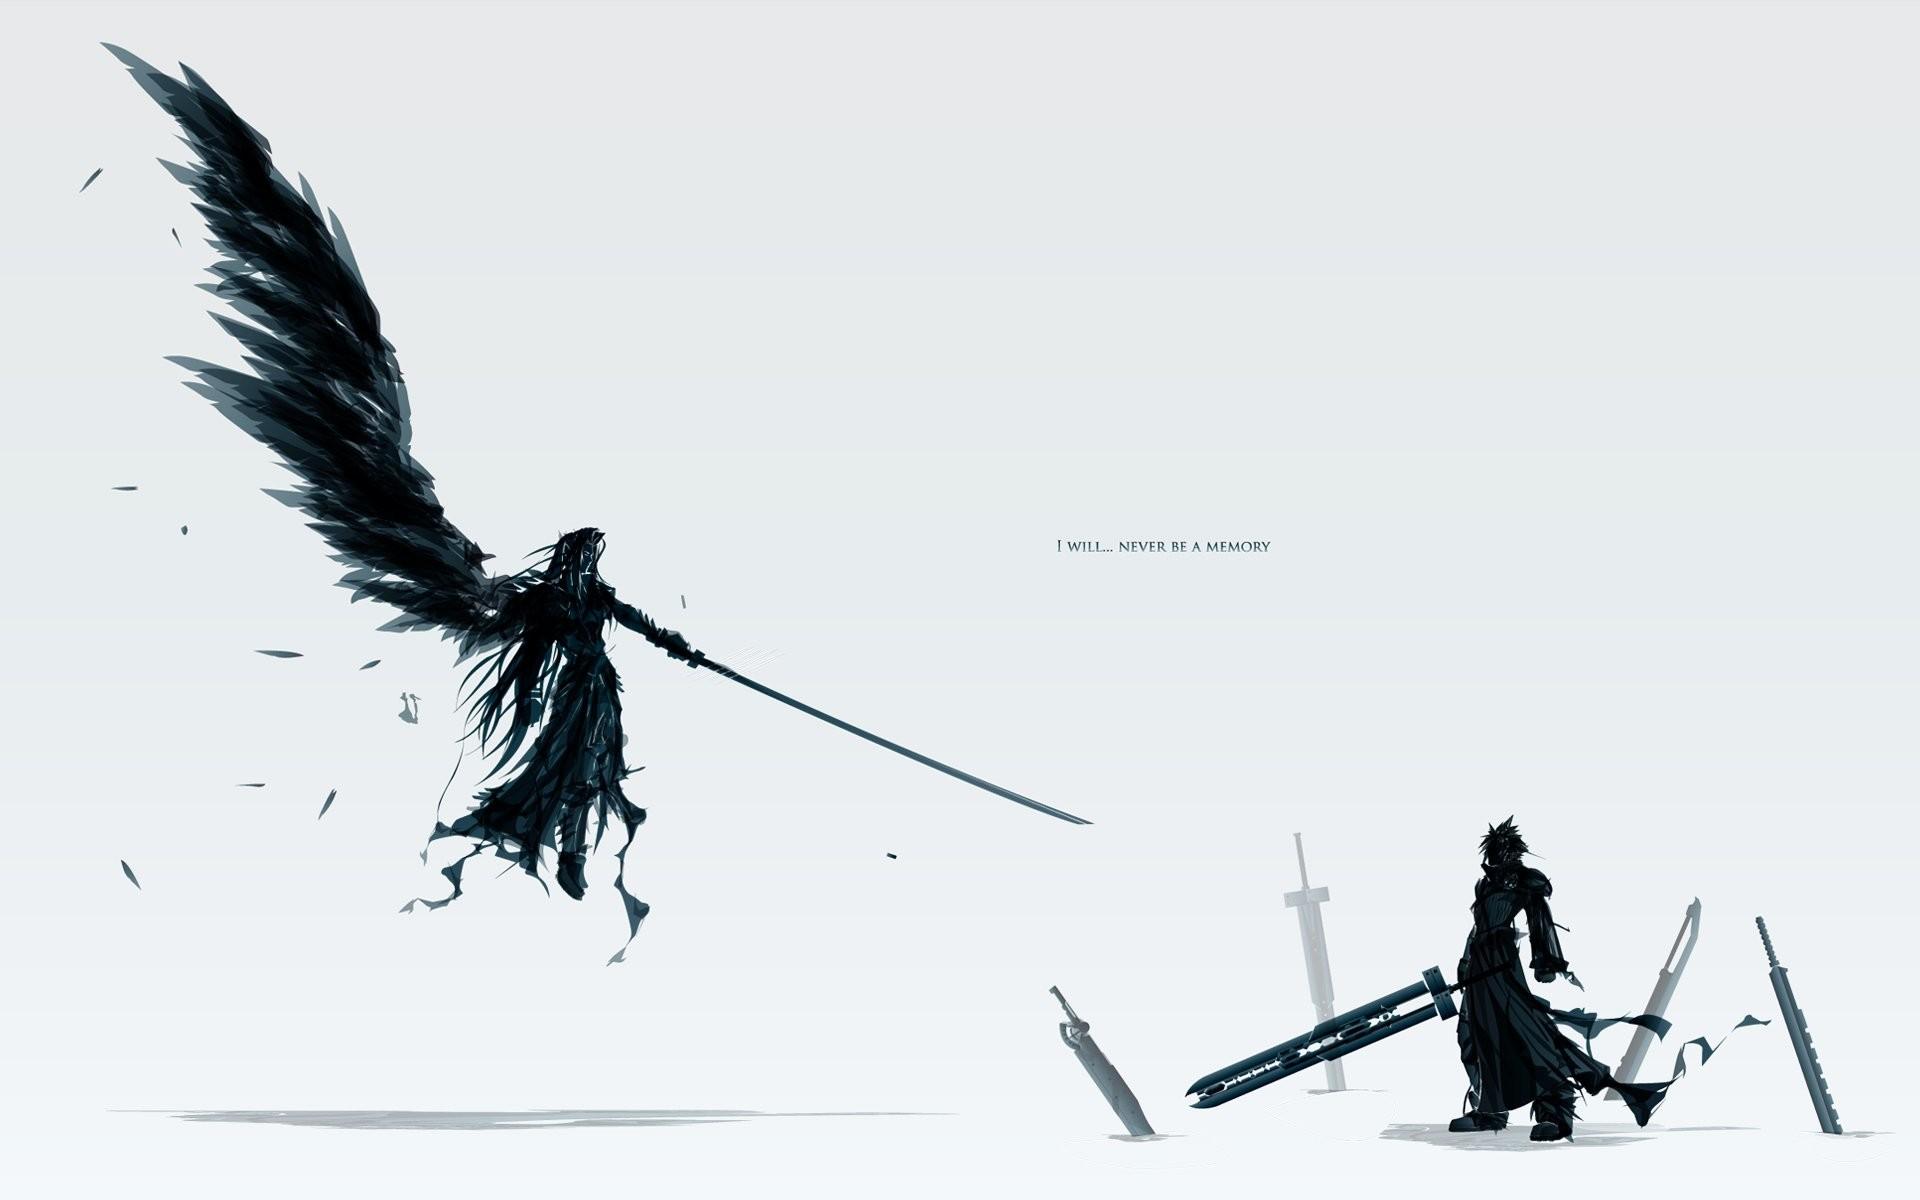 Final Fantasy HD Wallpapers Backgrounds Wallpaper